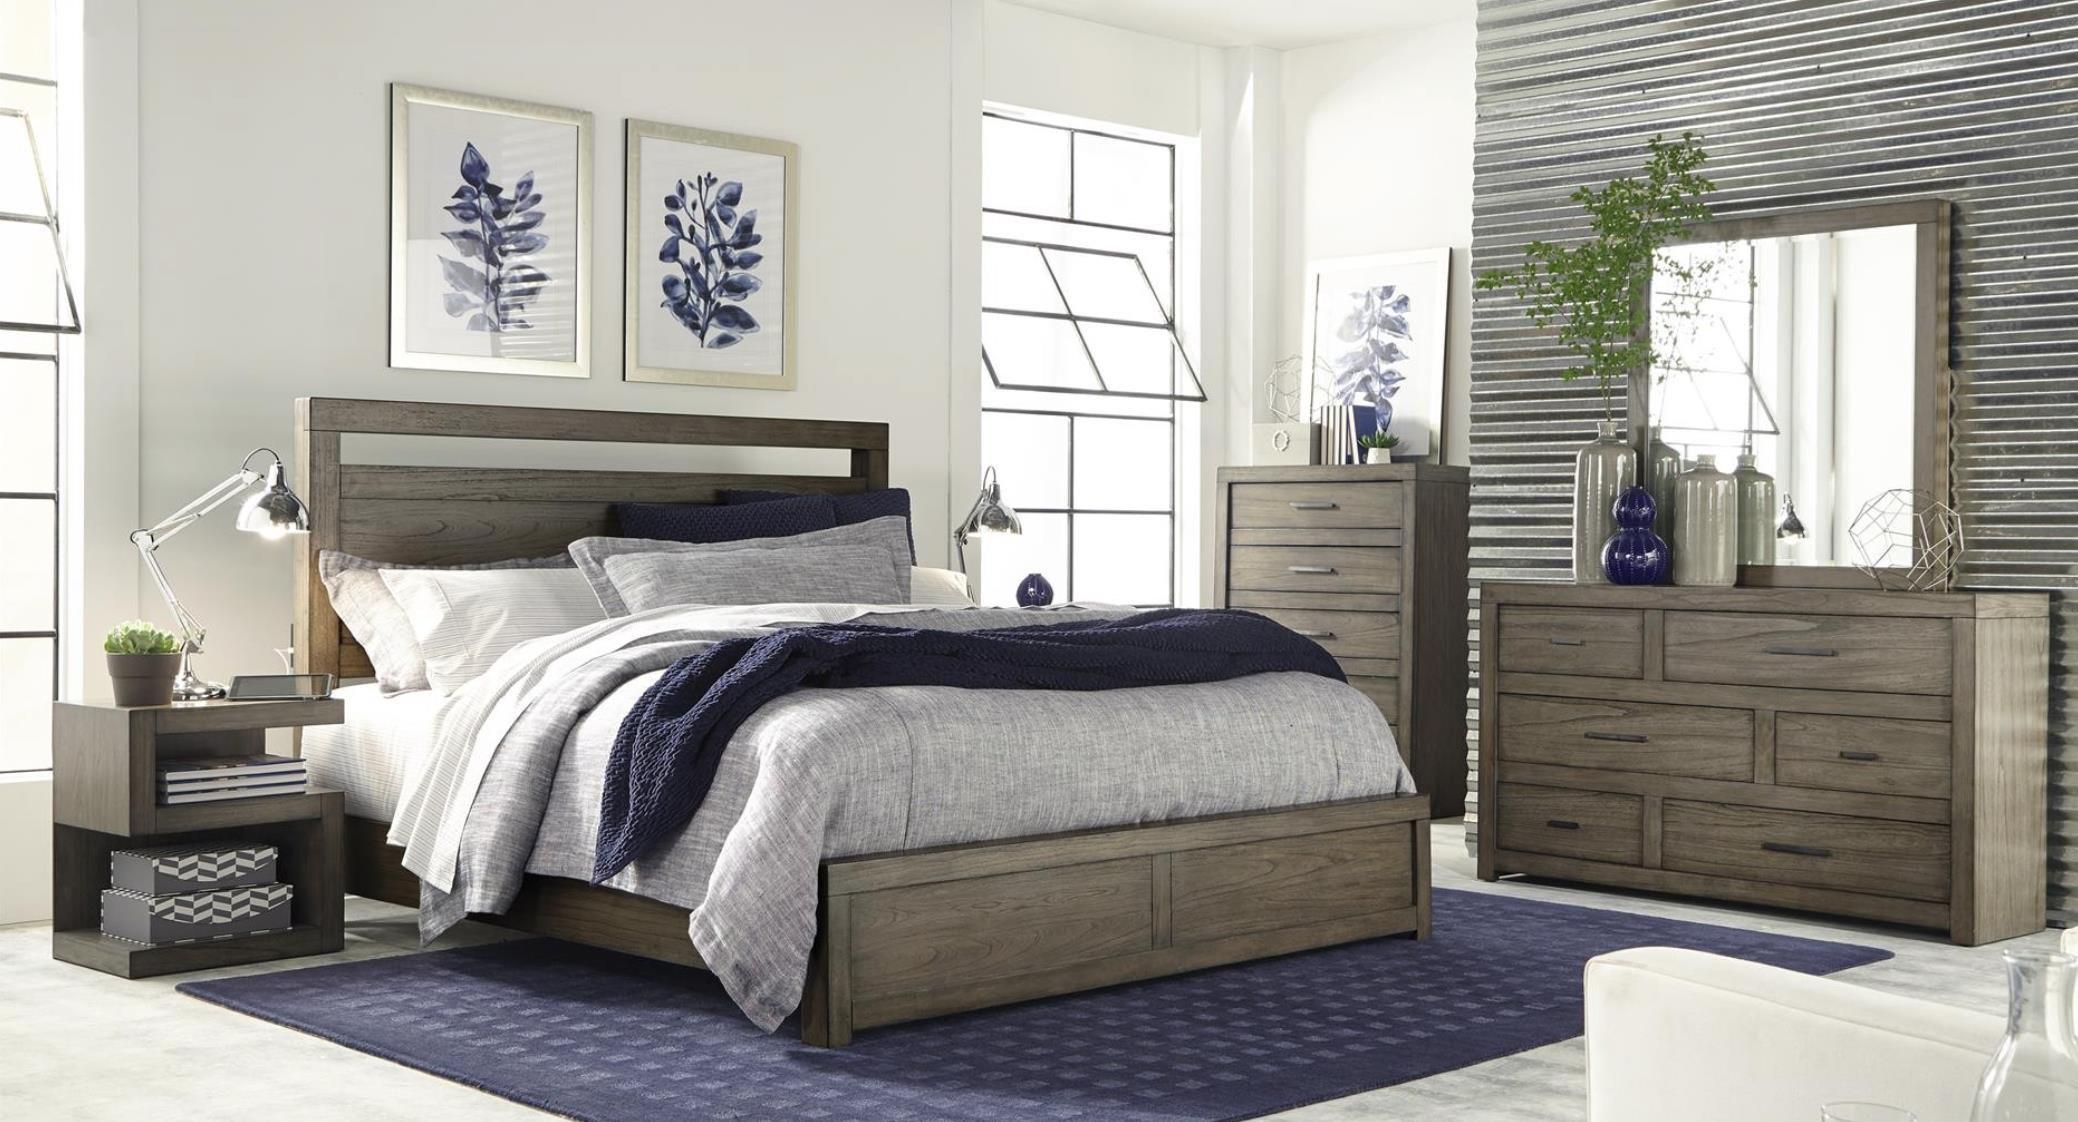 Hills of Aspen Modern Loft 4-Piece King Bedroom Set - Item Number: B17ML4-K4PC